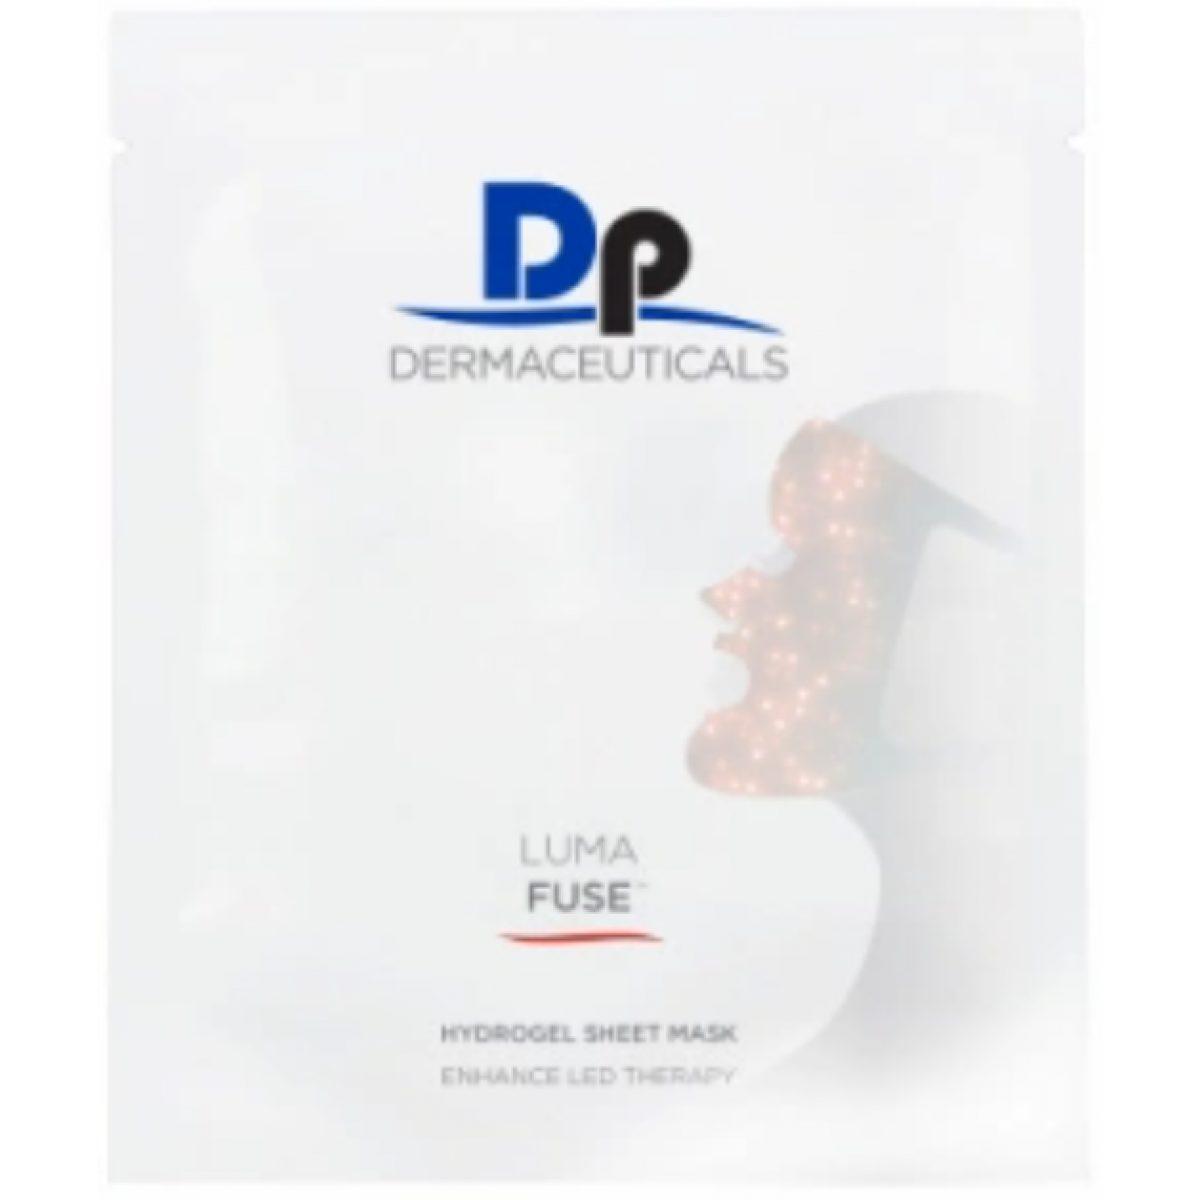 Dp Dermaceuticals LumaFuse Hydrogel Sheet Mask